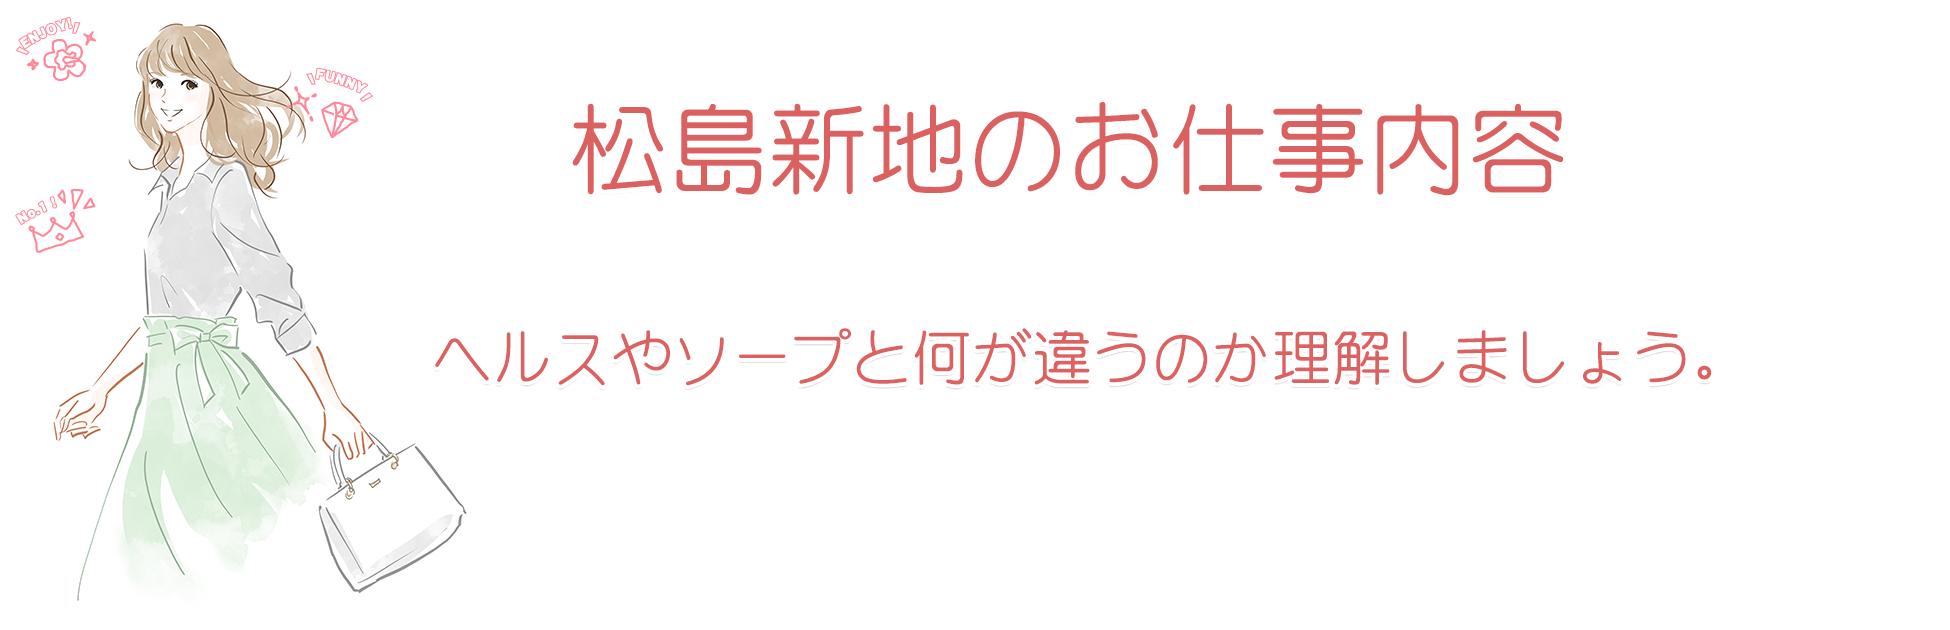 島新地の仕事内容を徹底解説!|松島新地求人